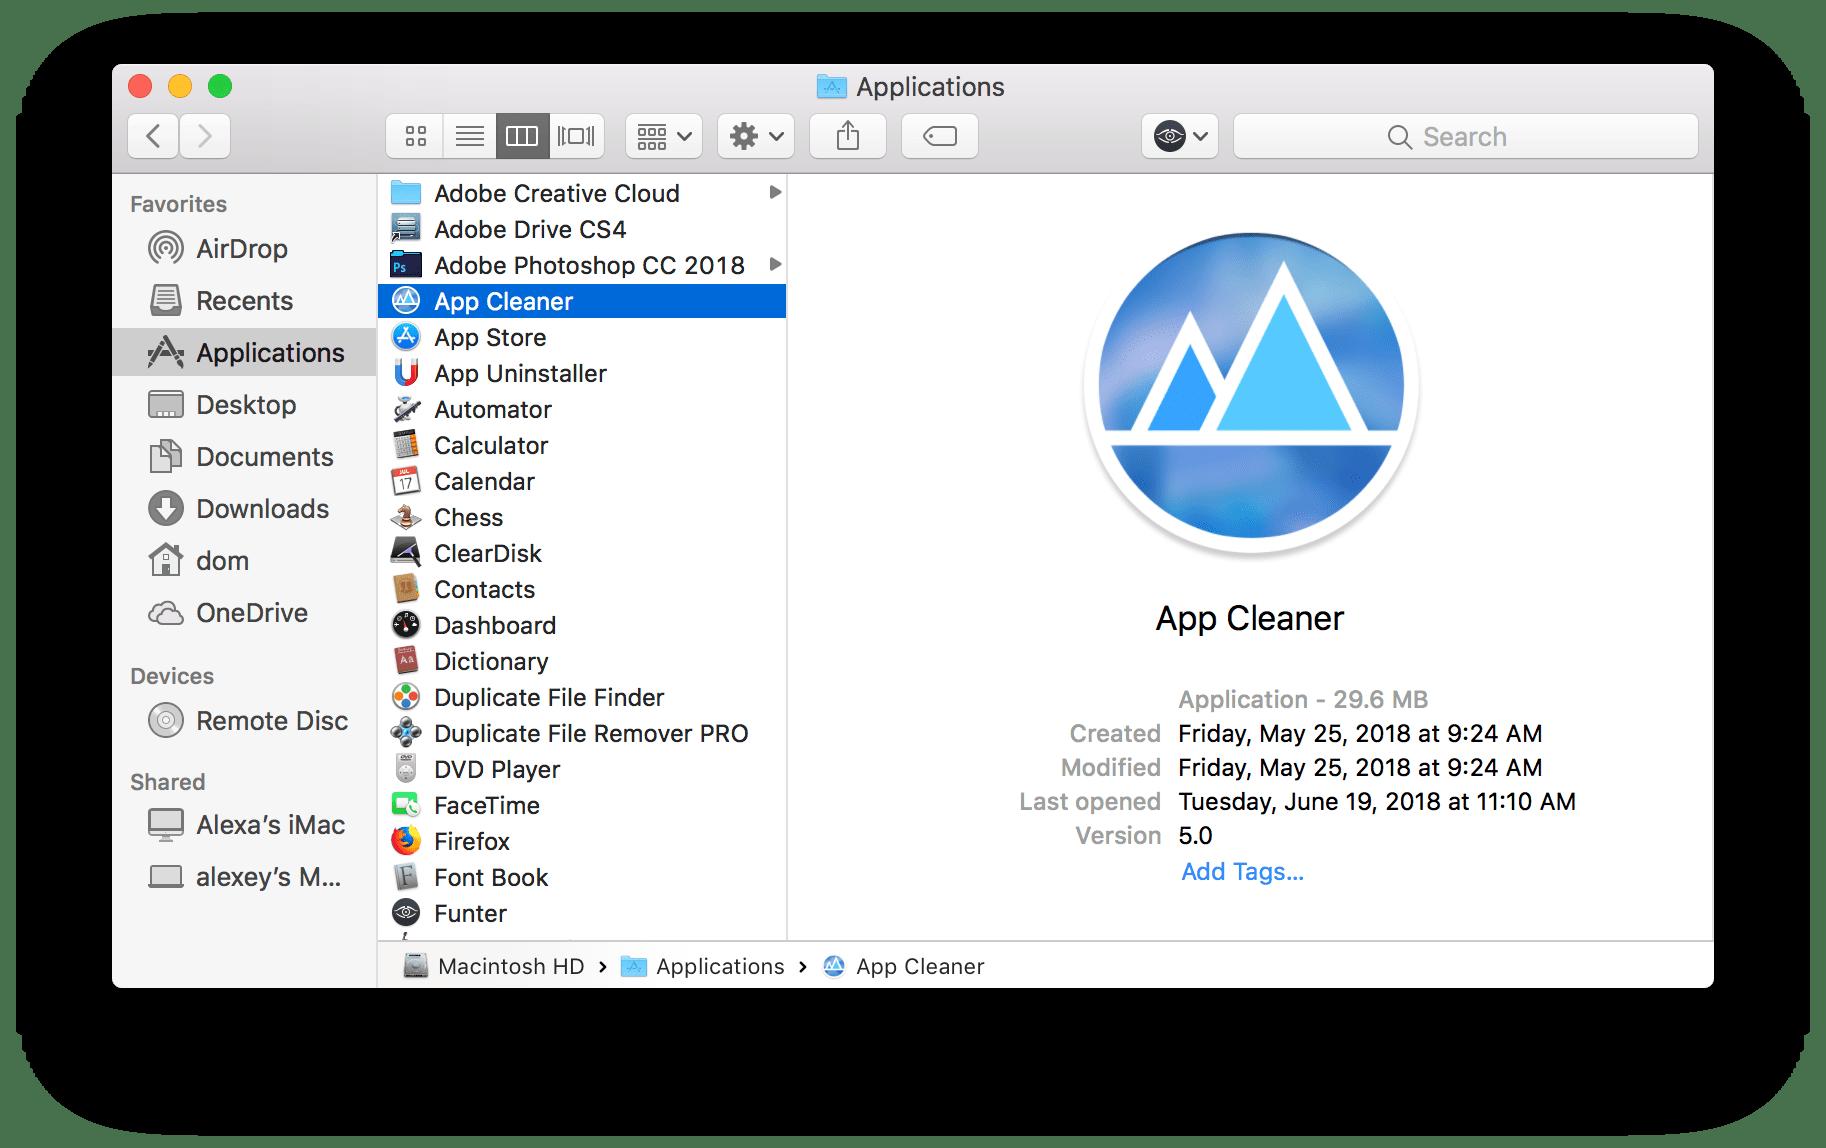 app cleaner app